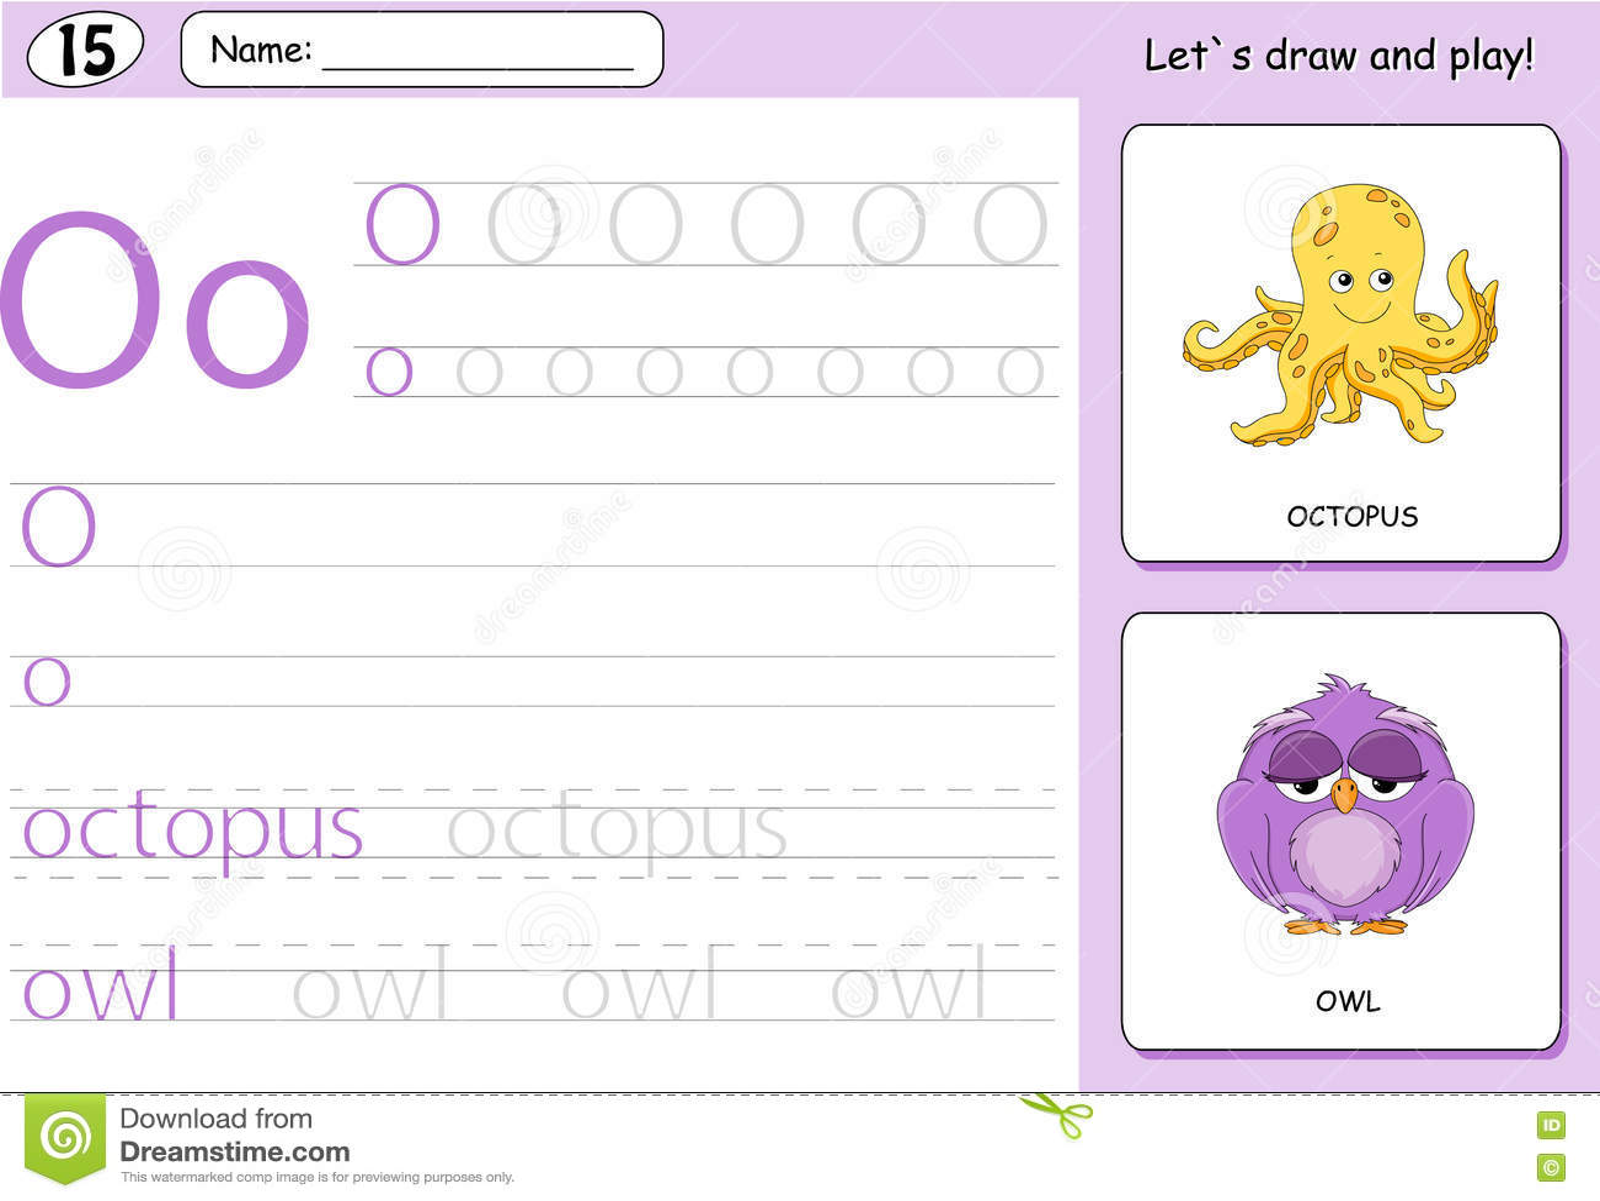 Cartoon Octopus And Owl Alphabet Tracing Worksheet Stock